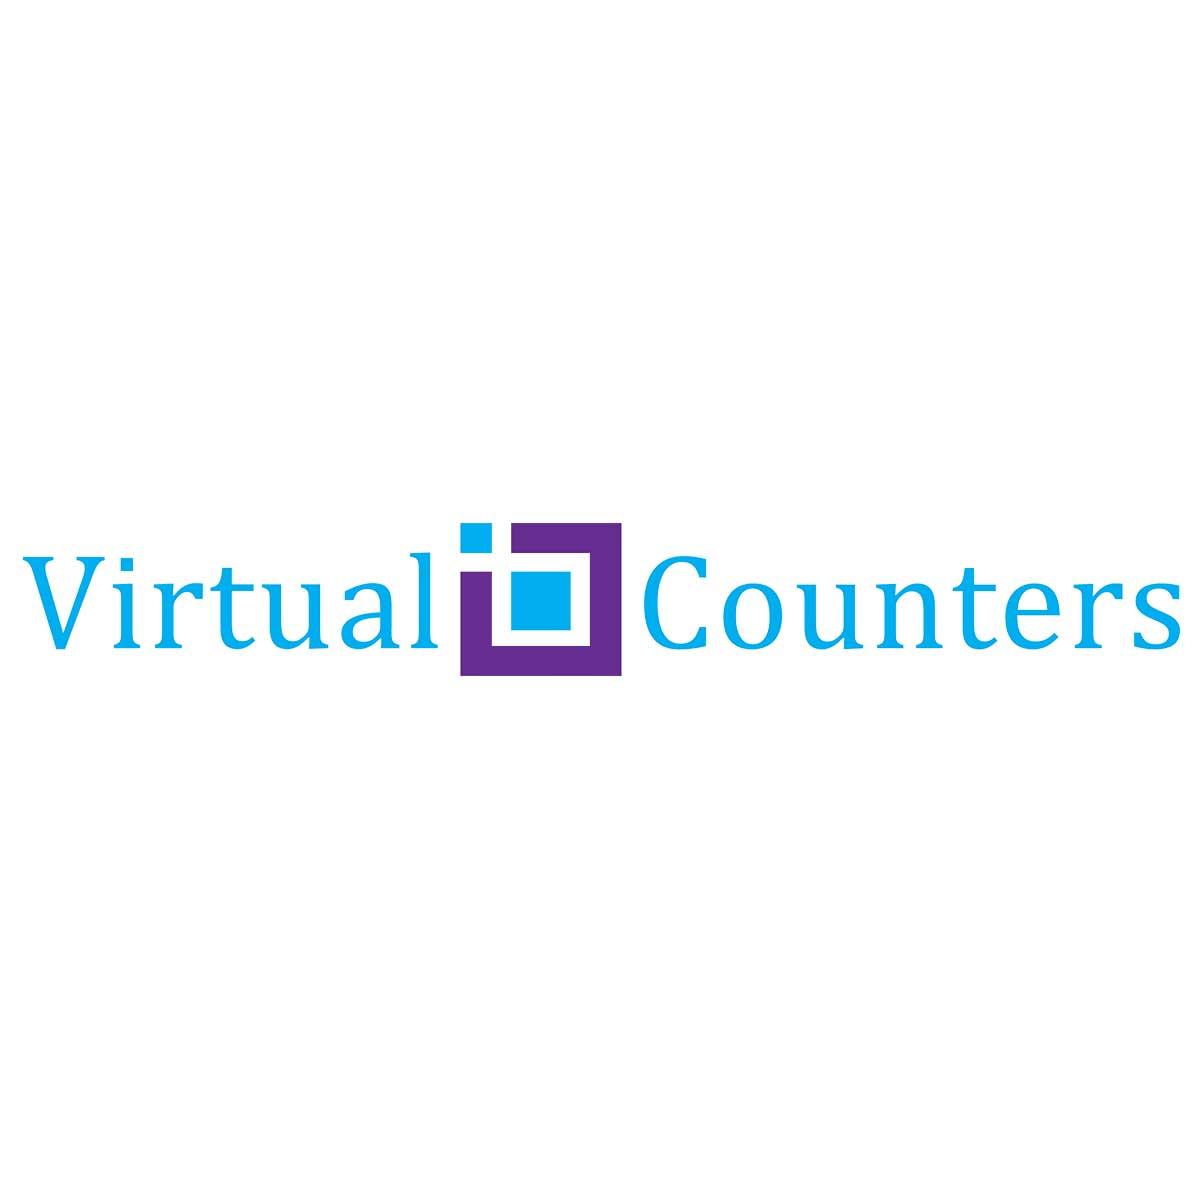 vritual-counterss